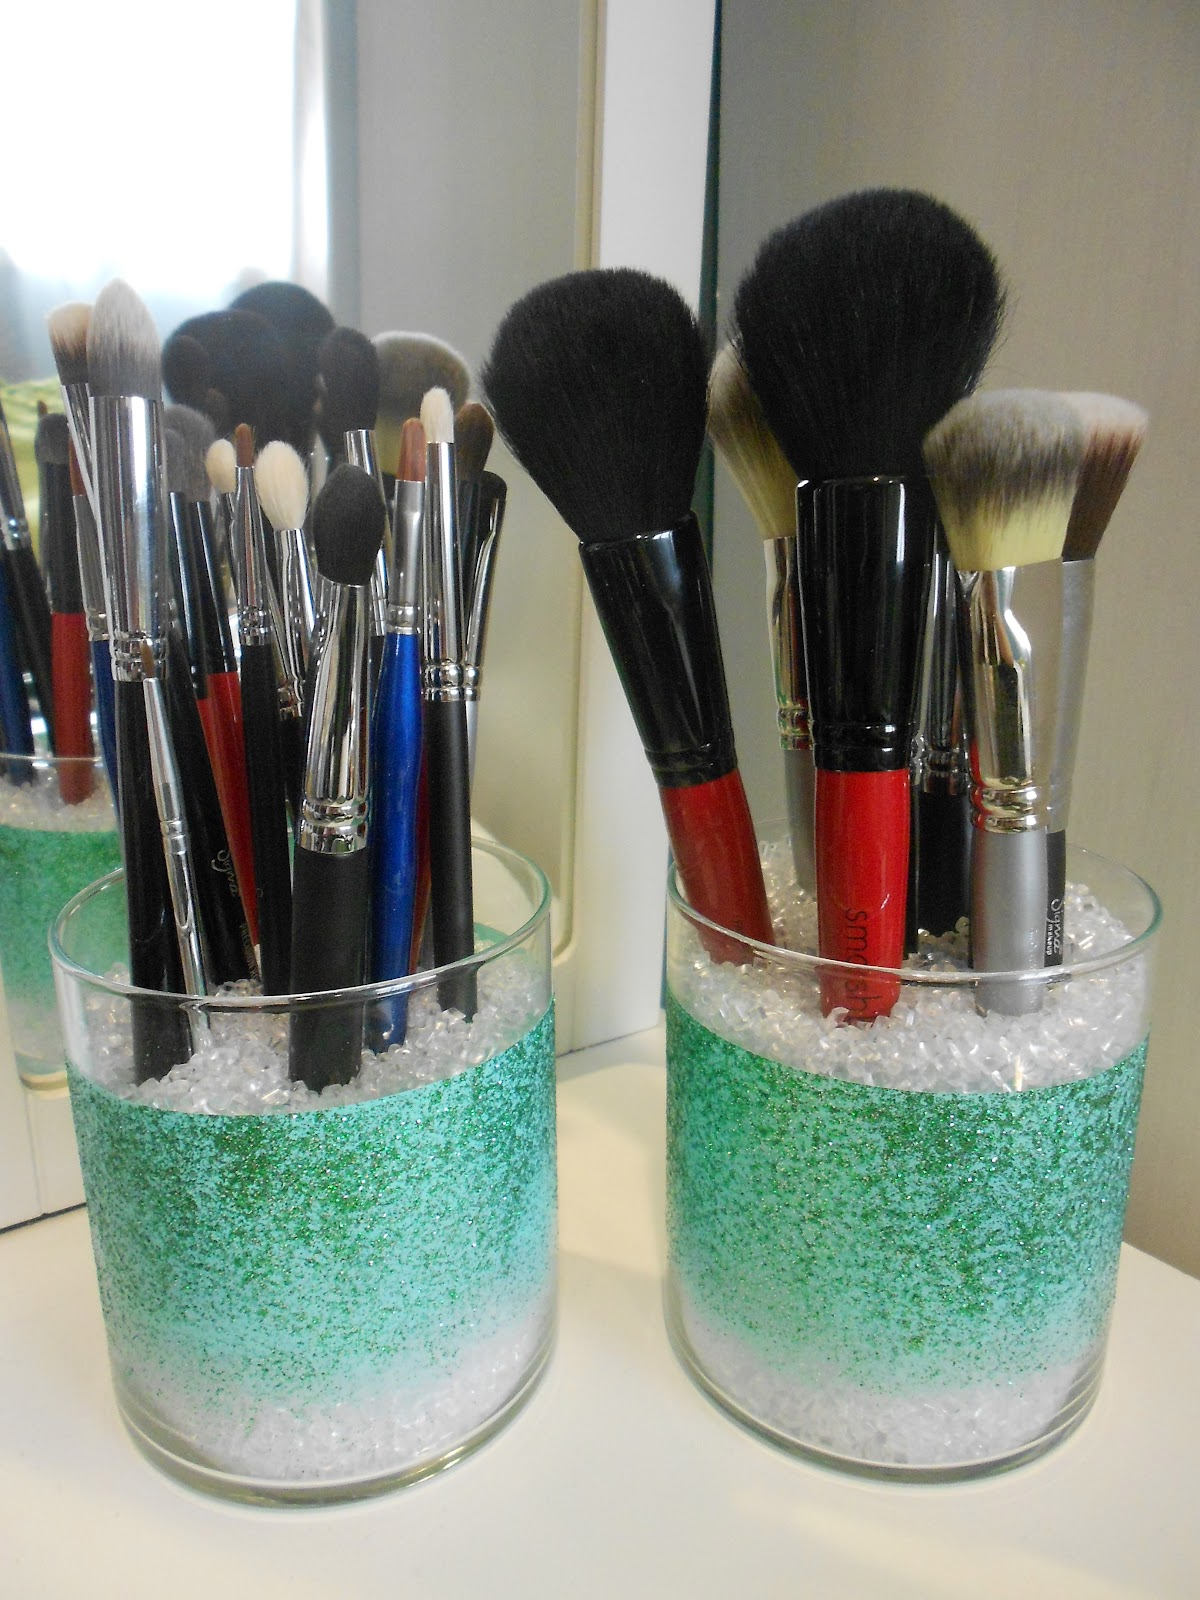 Make Up Brush Holders | Top Make Up Brushes